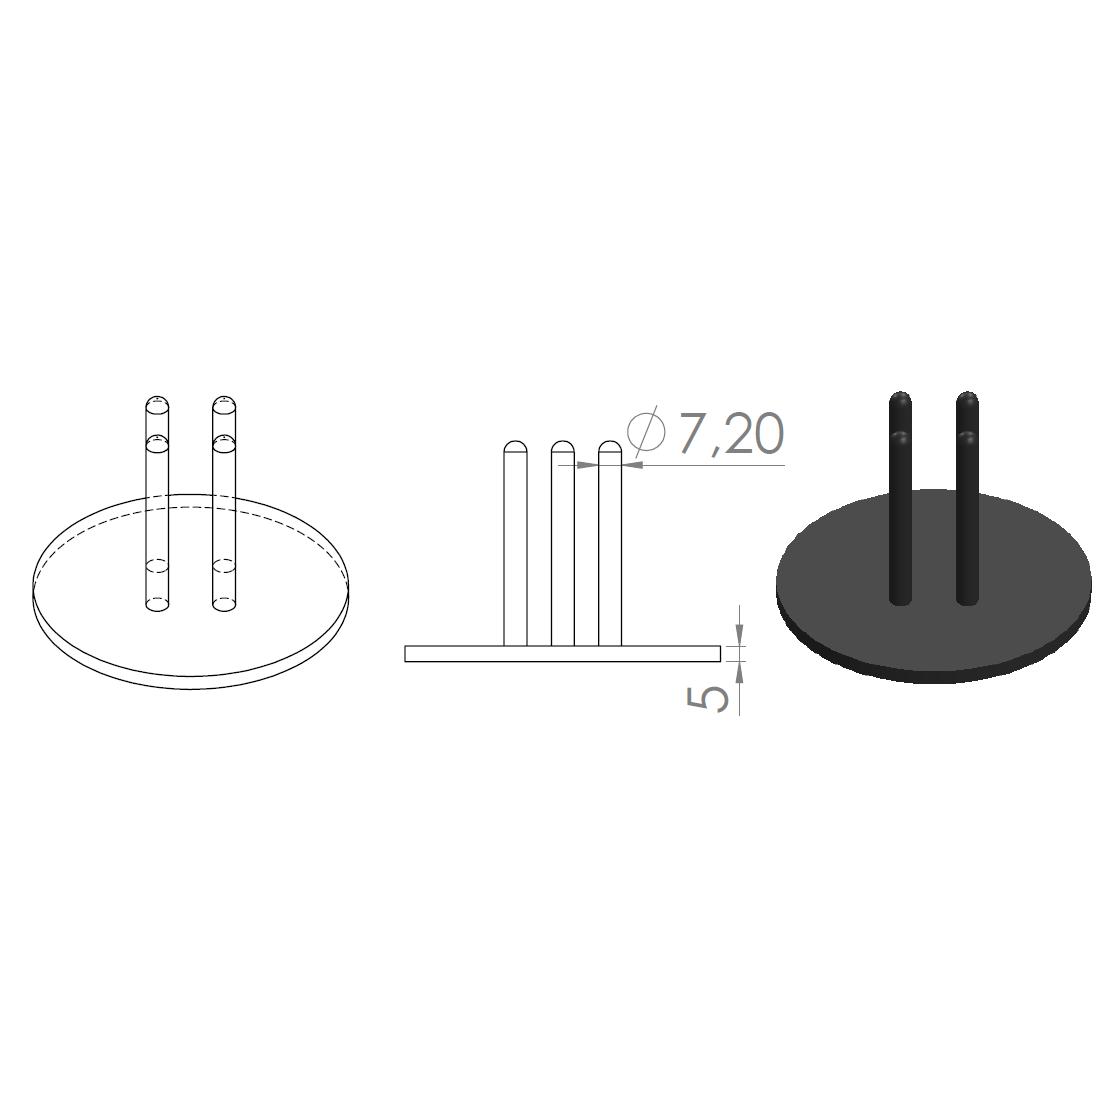 2.png Download free STL file Cup mats • 3D print design, GuilhemPerroud